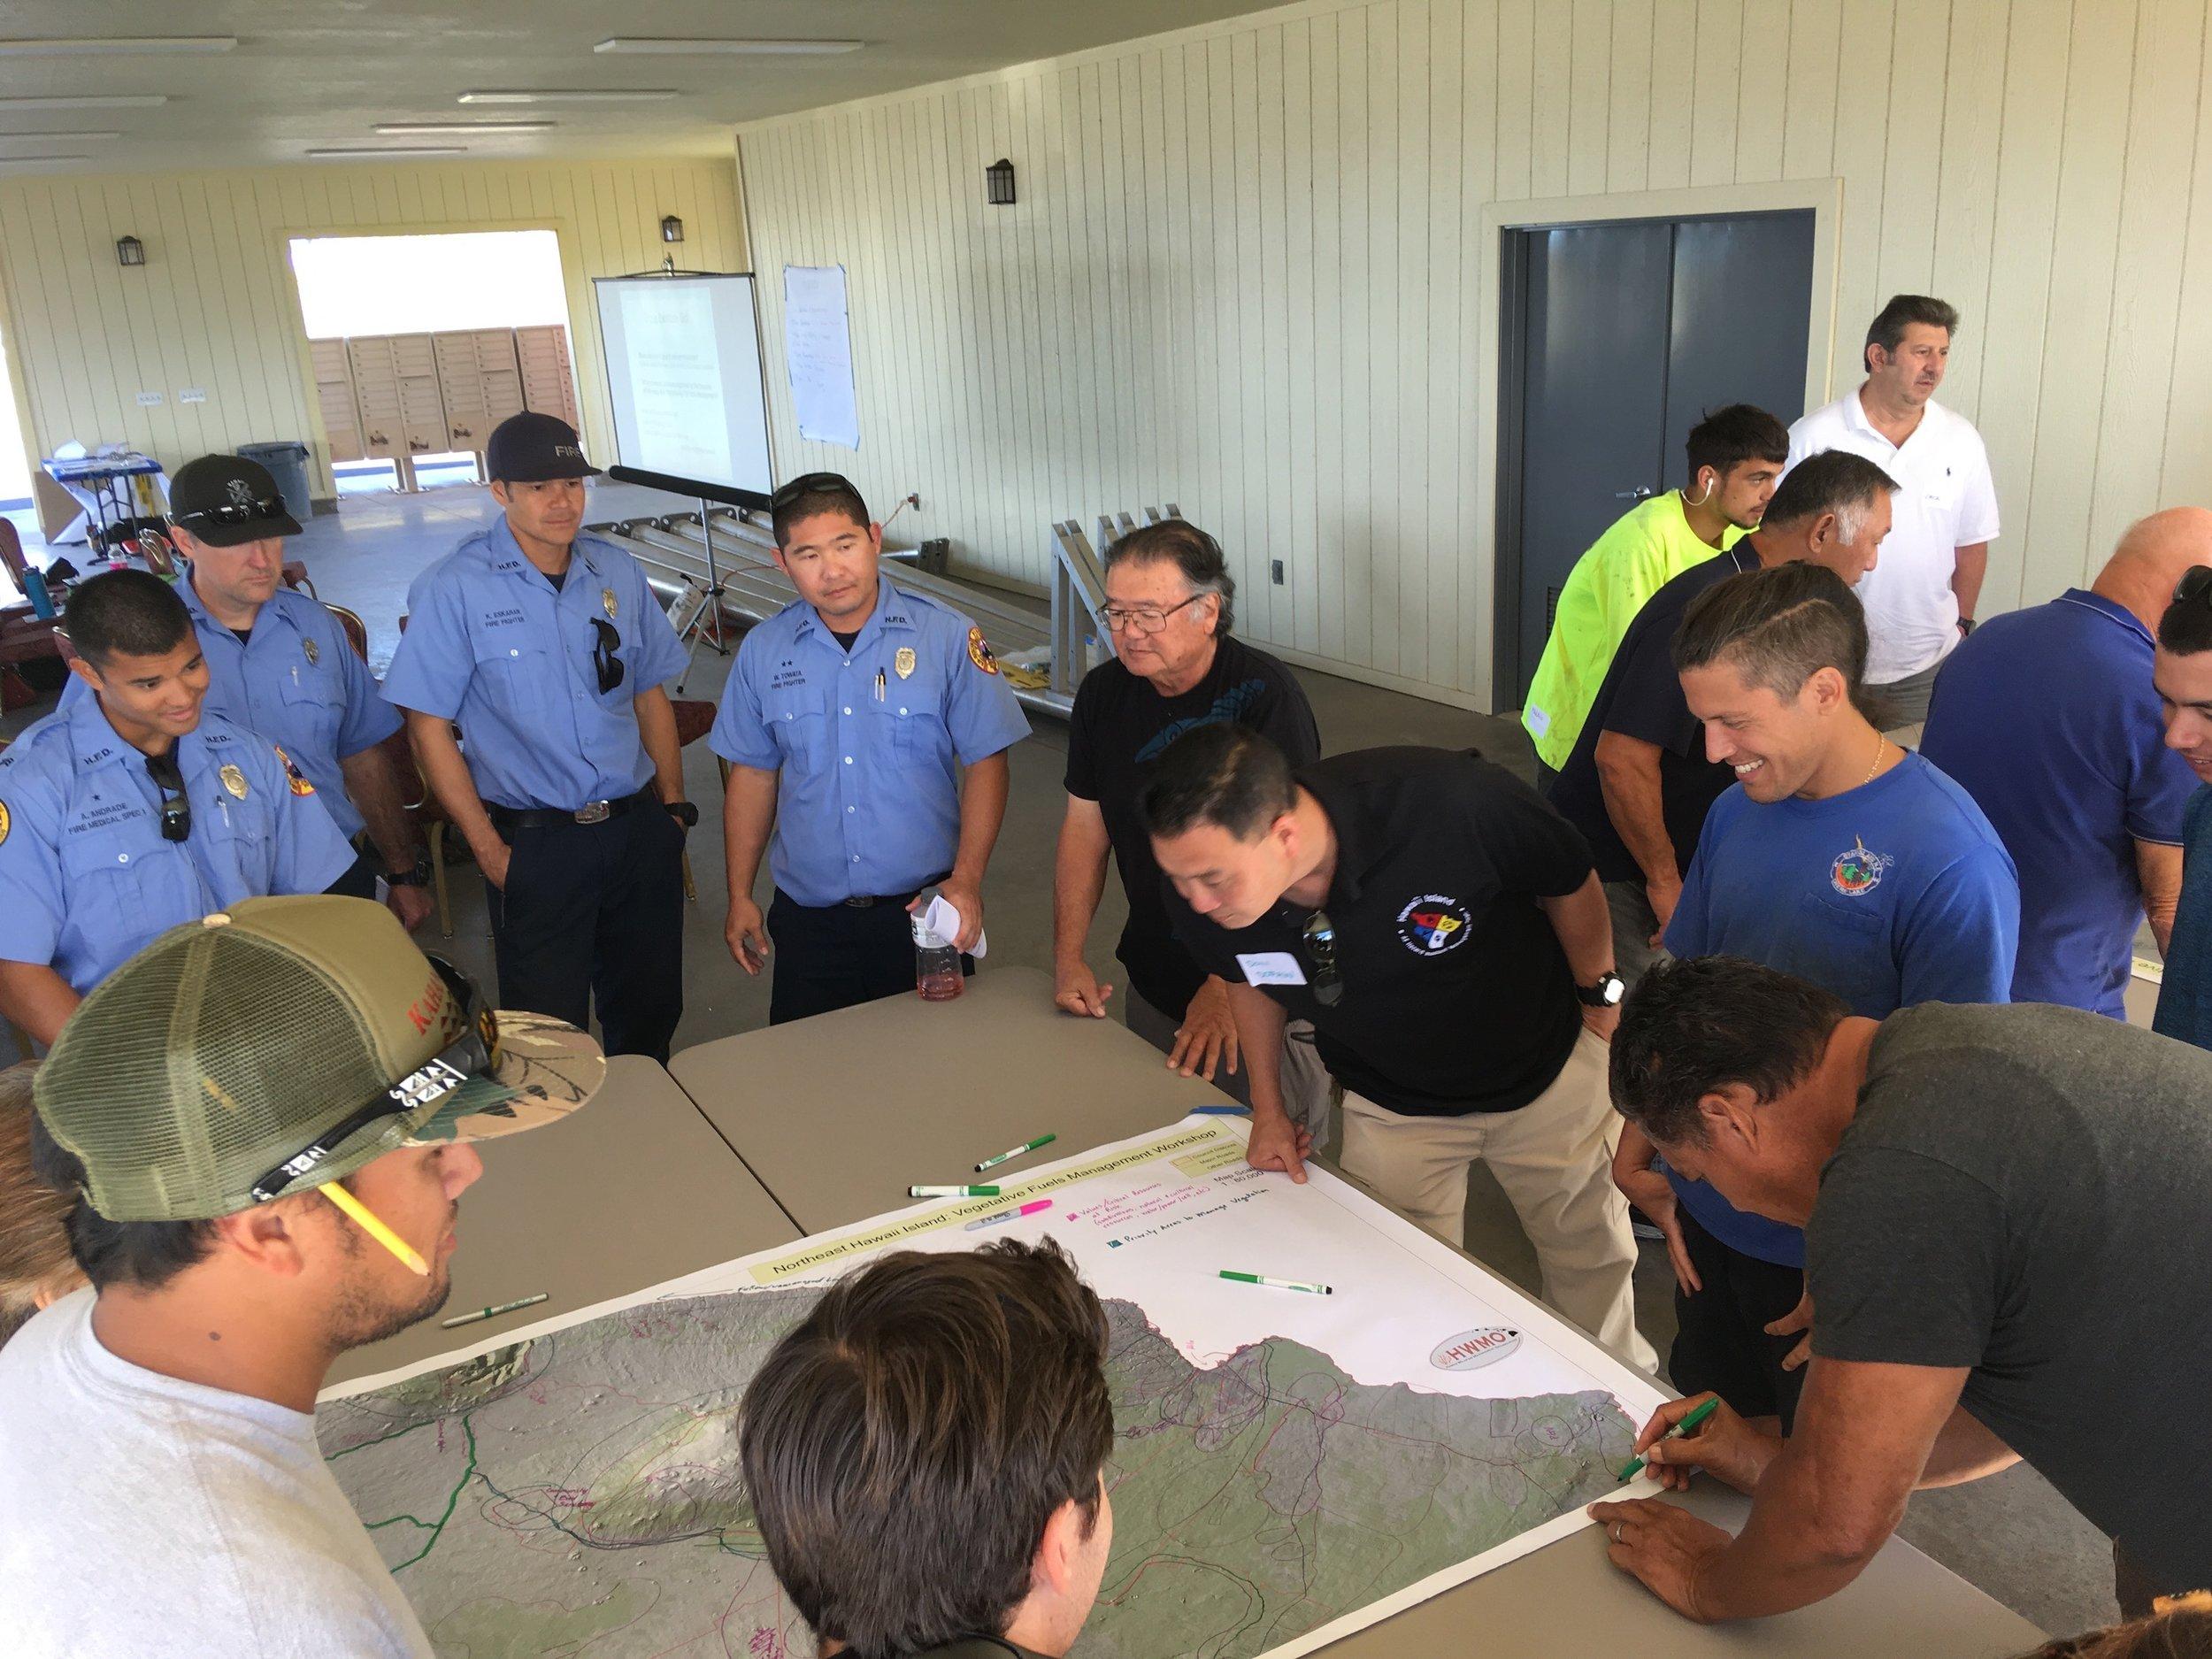 Hawaii Island Kailapa Vegetative Fuels Management Collaborative Action Planning Workshop_2_26_2019_26.jpg